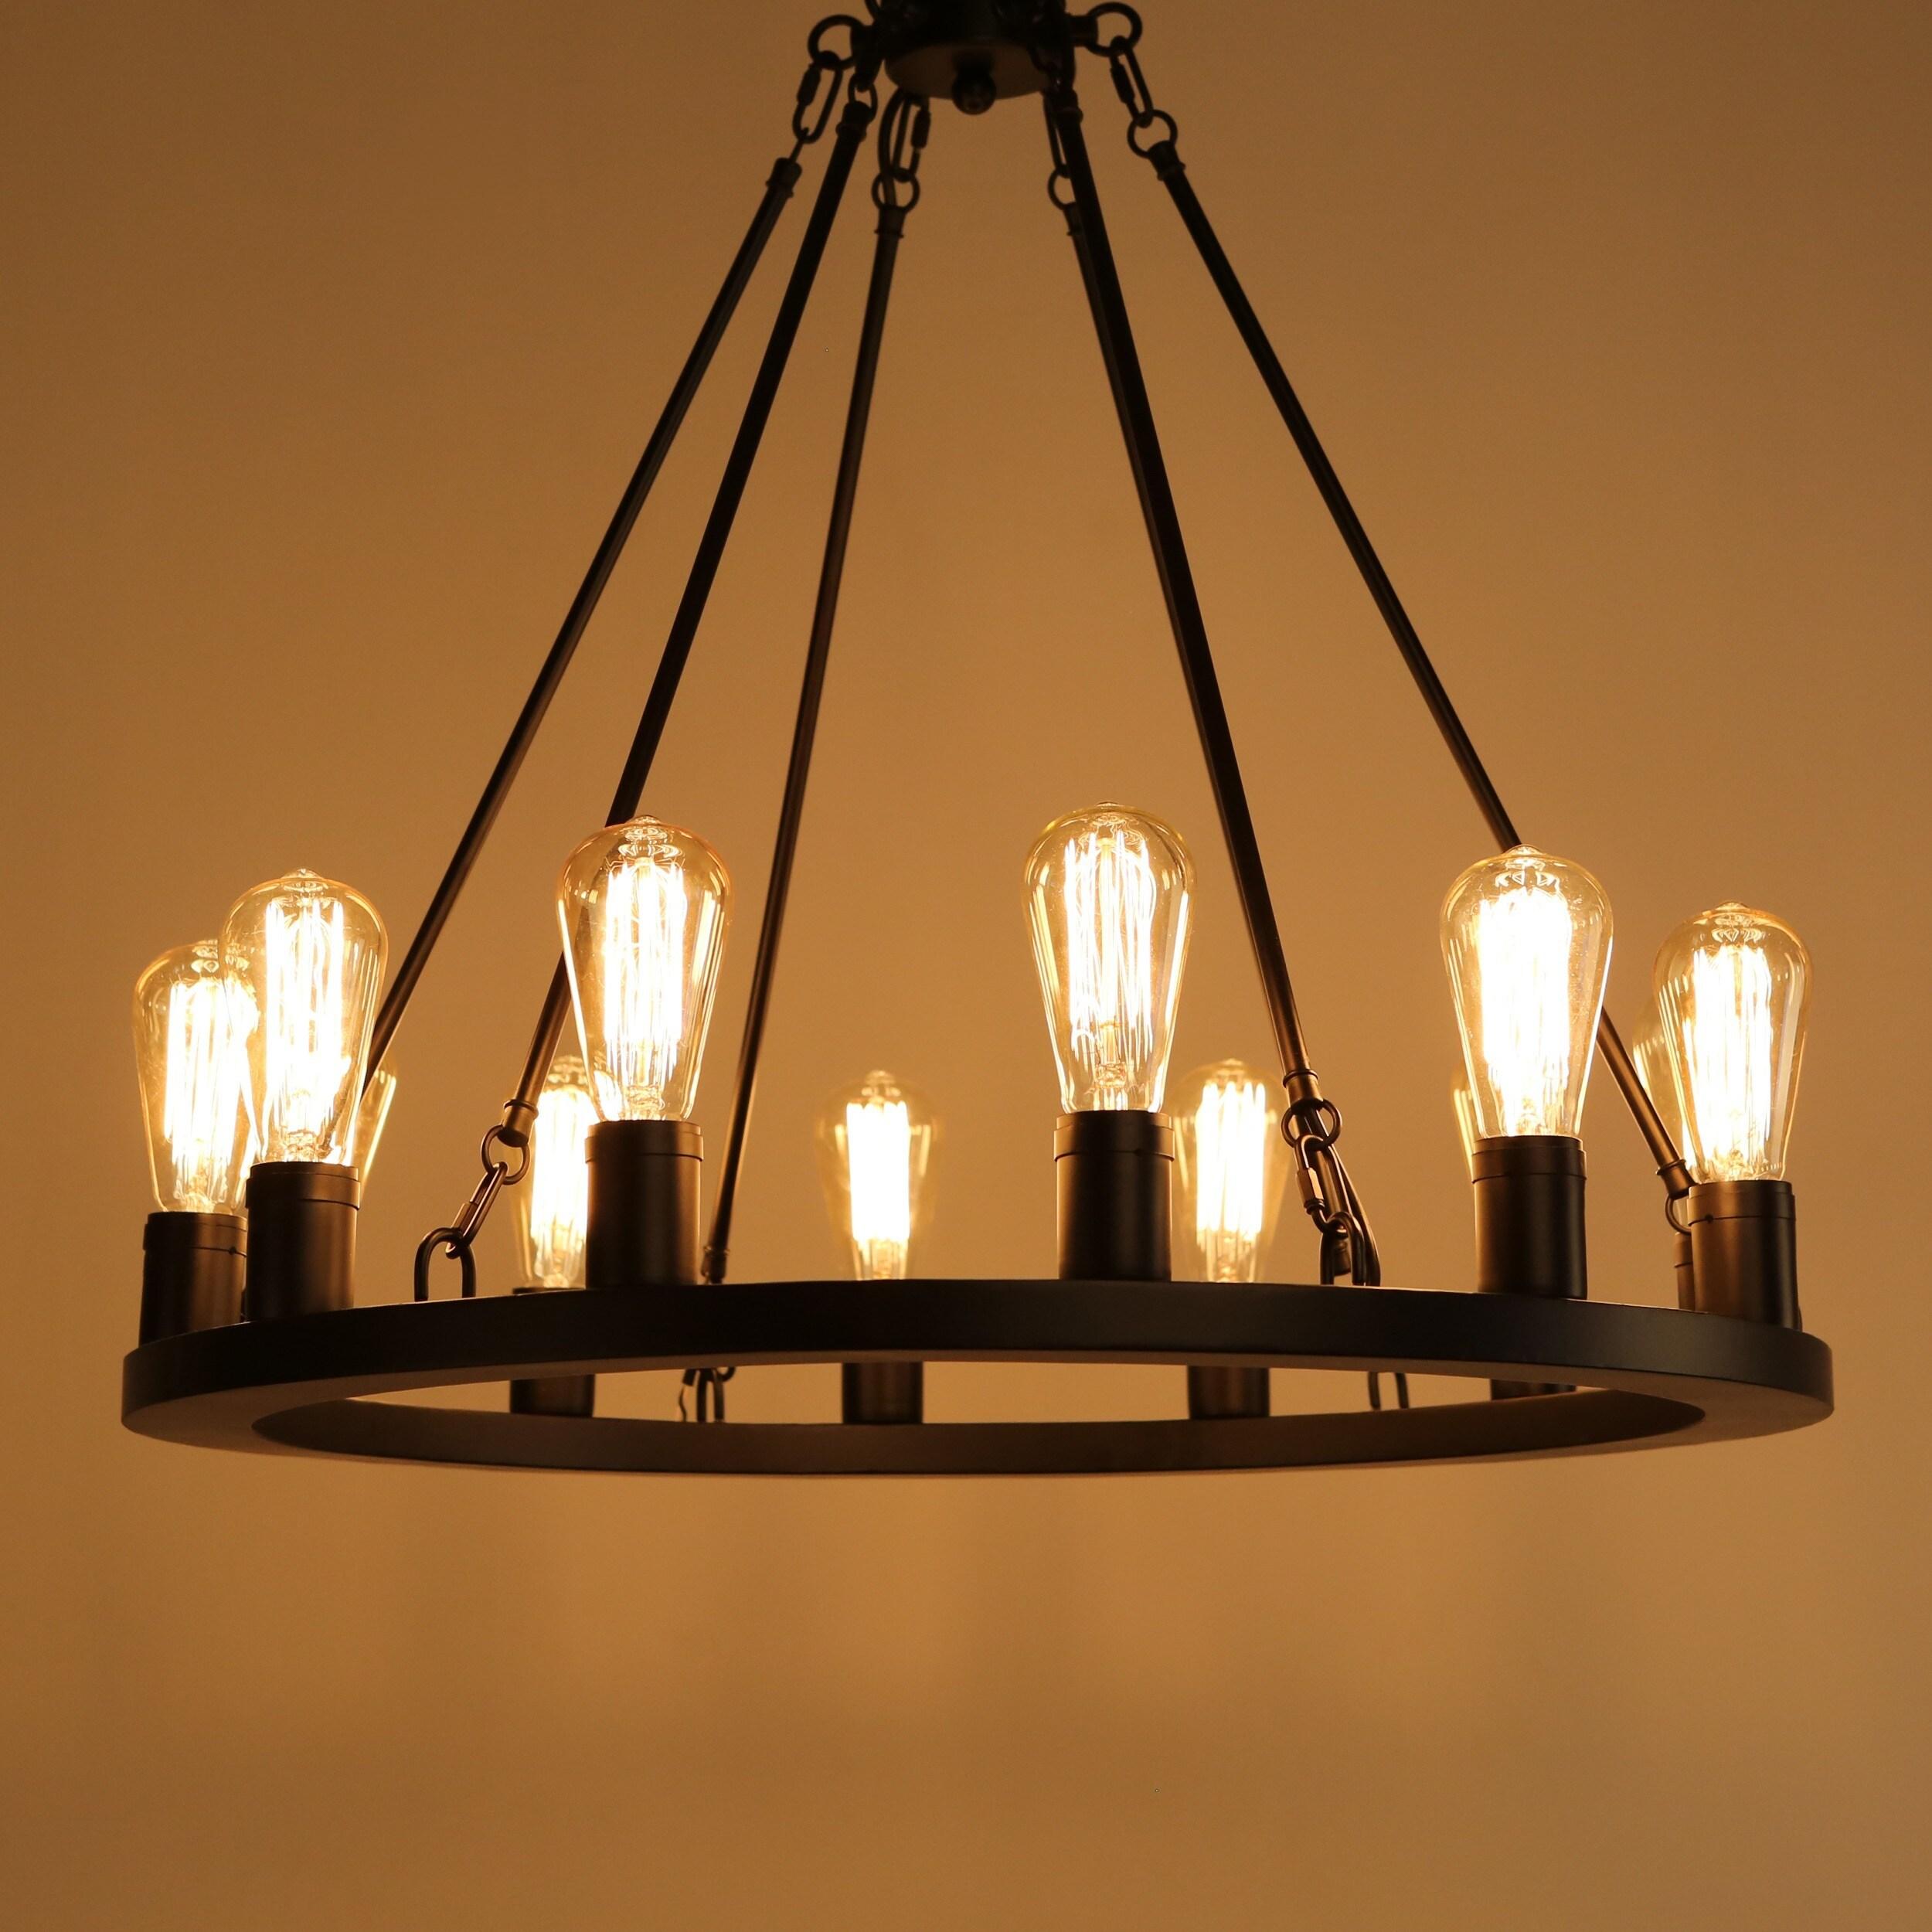 journee lighting. Journee Home Rifkin Iron 25-inch Hardwired Chandelier - Free Shipping Today Overstock 23426315 Lighting